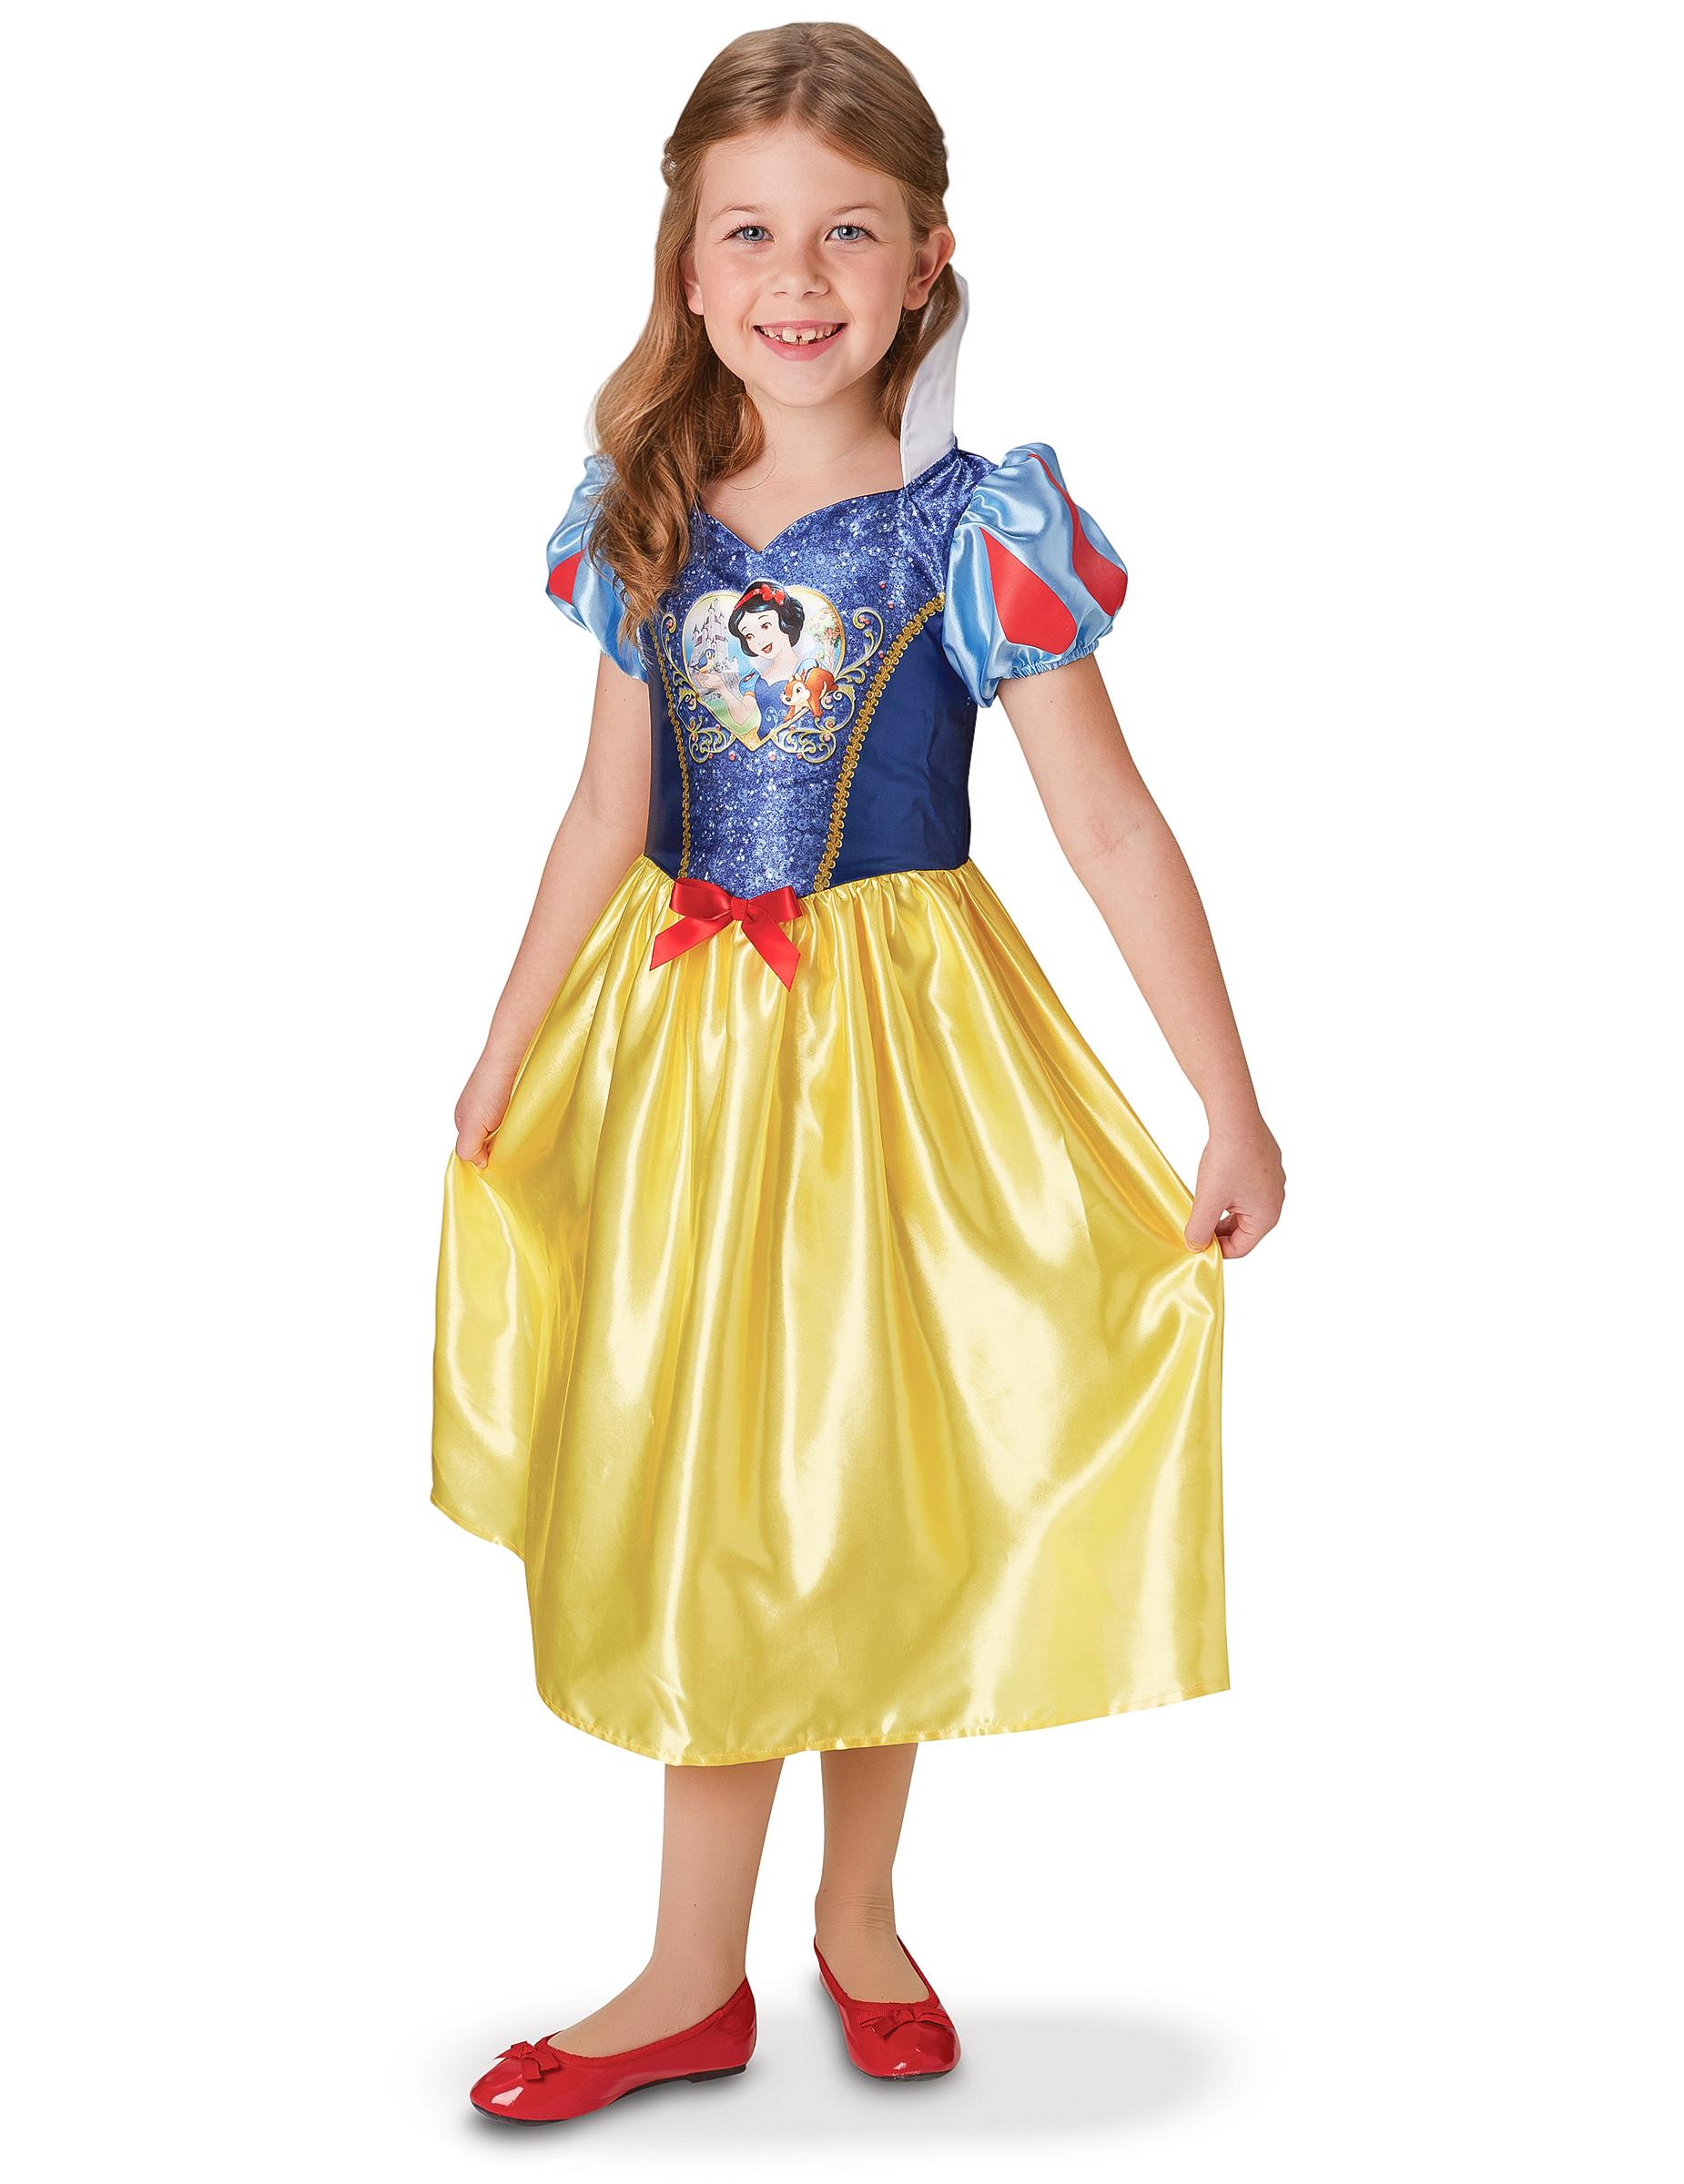 0e29f37d0be97 Costume Biancaneve™ per bambina  Costumi bambini